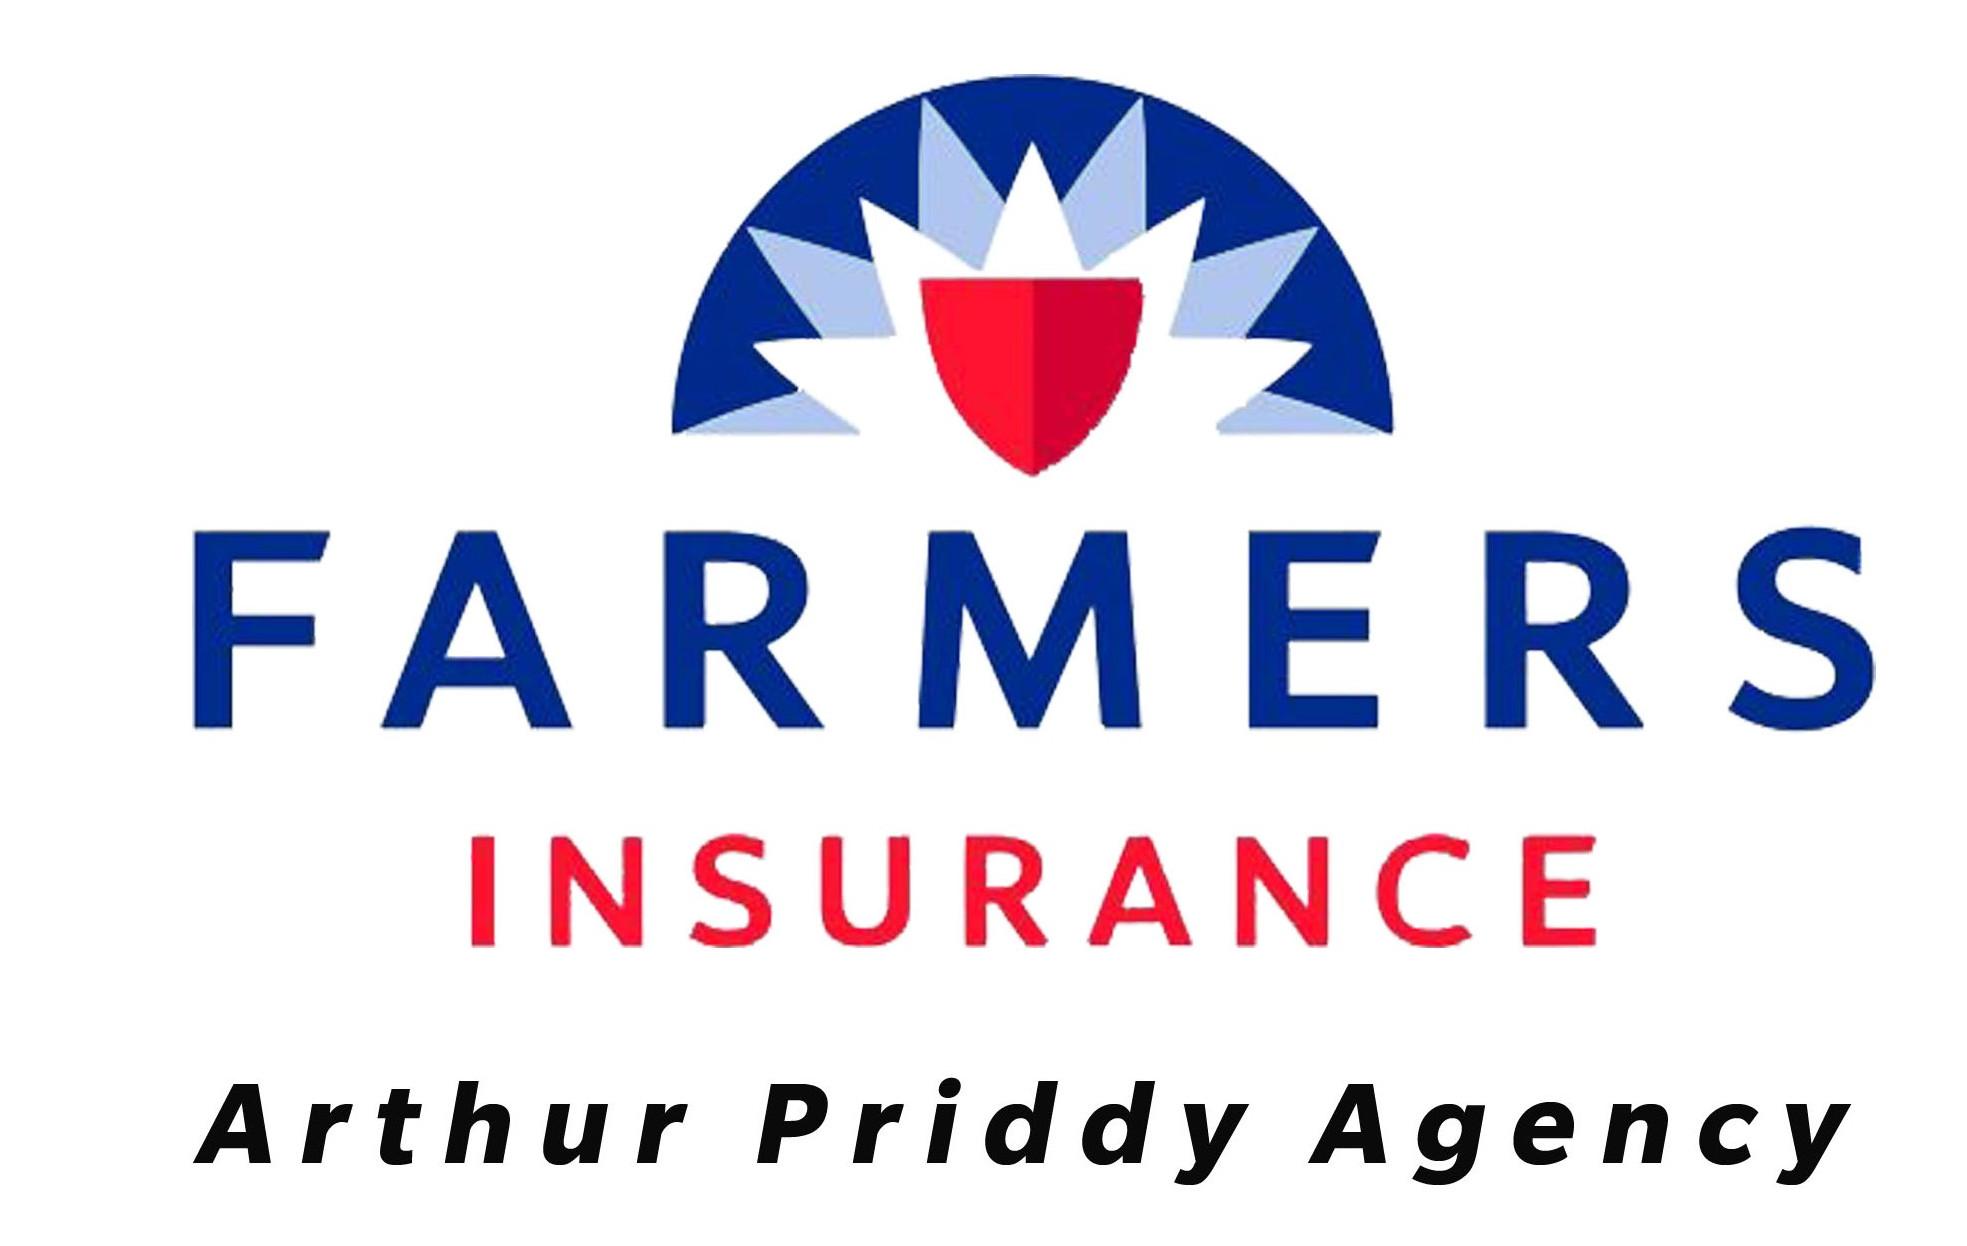 Farmers Insurance, Arthur Priddy Agency - FINISH LINE SPONSOR